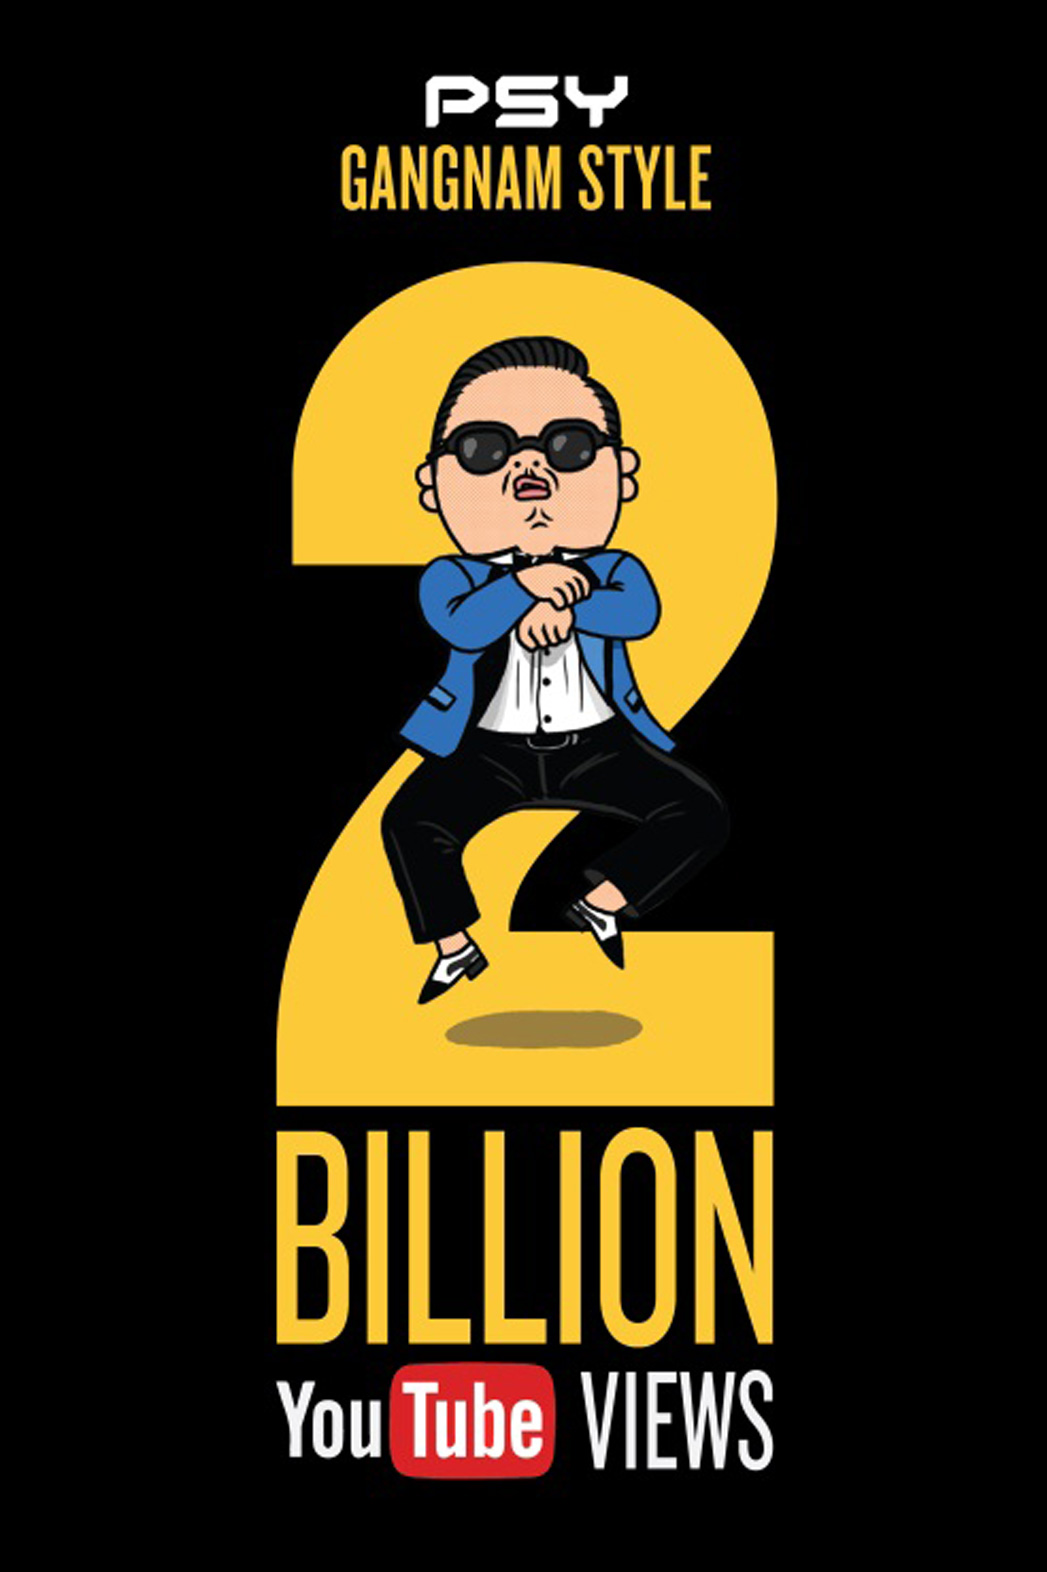 Psy Gangnam Style 2 Billions YouTube Views Poster - P 2014